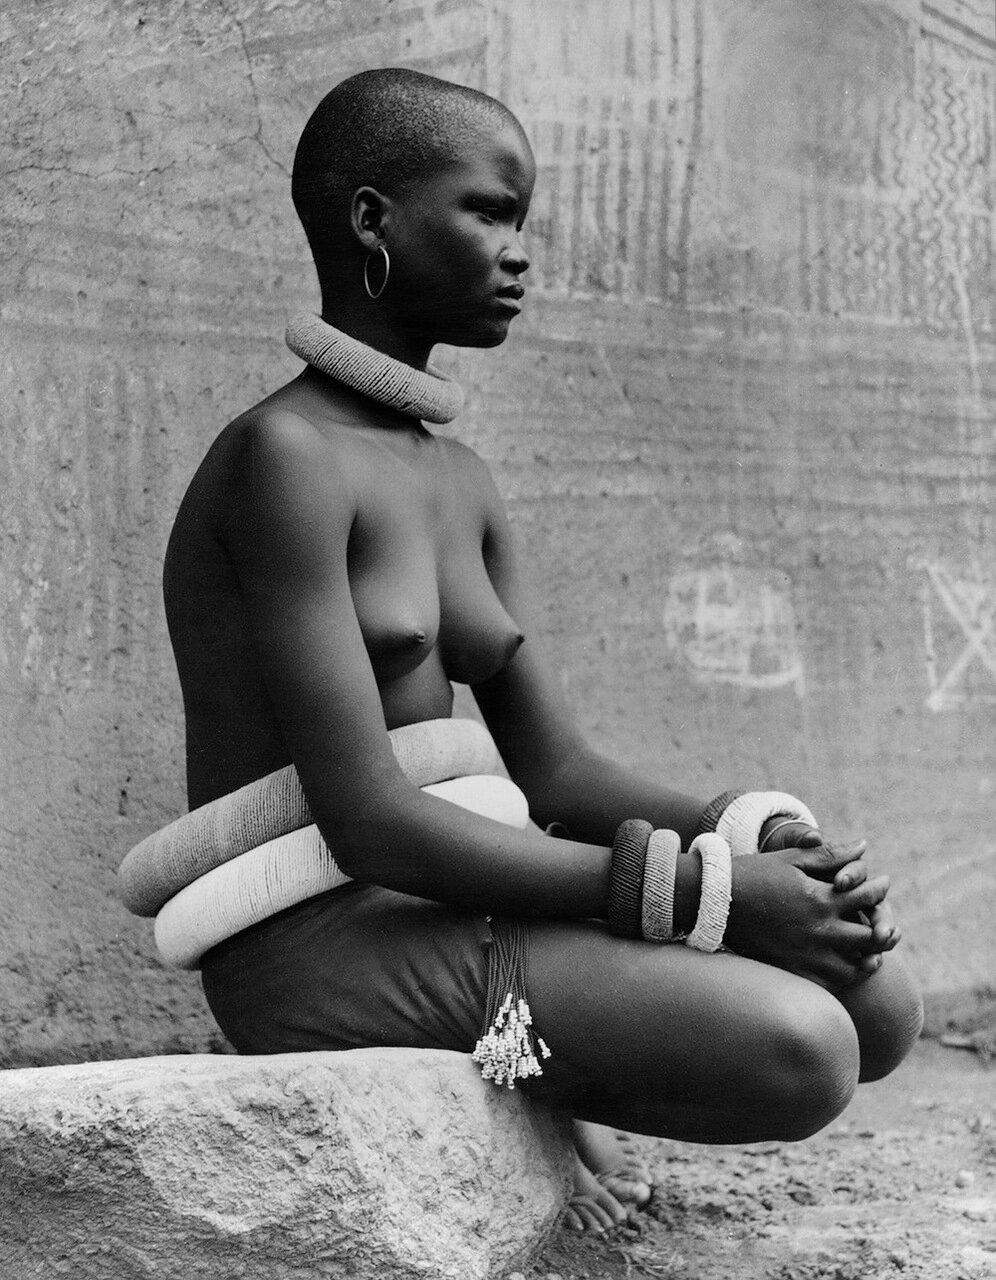 Женщина племени Ндебеле. Южная Африка, 1930-е годы